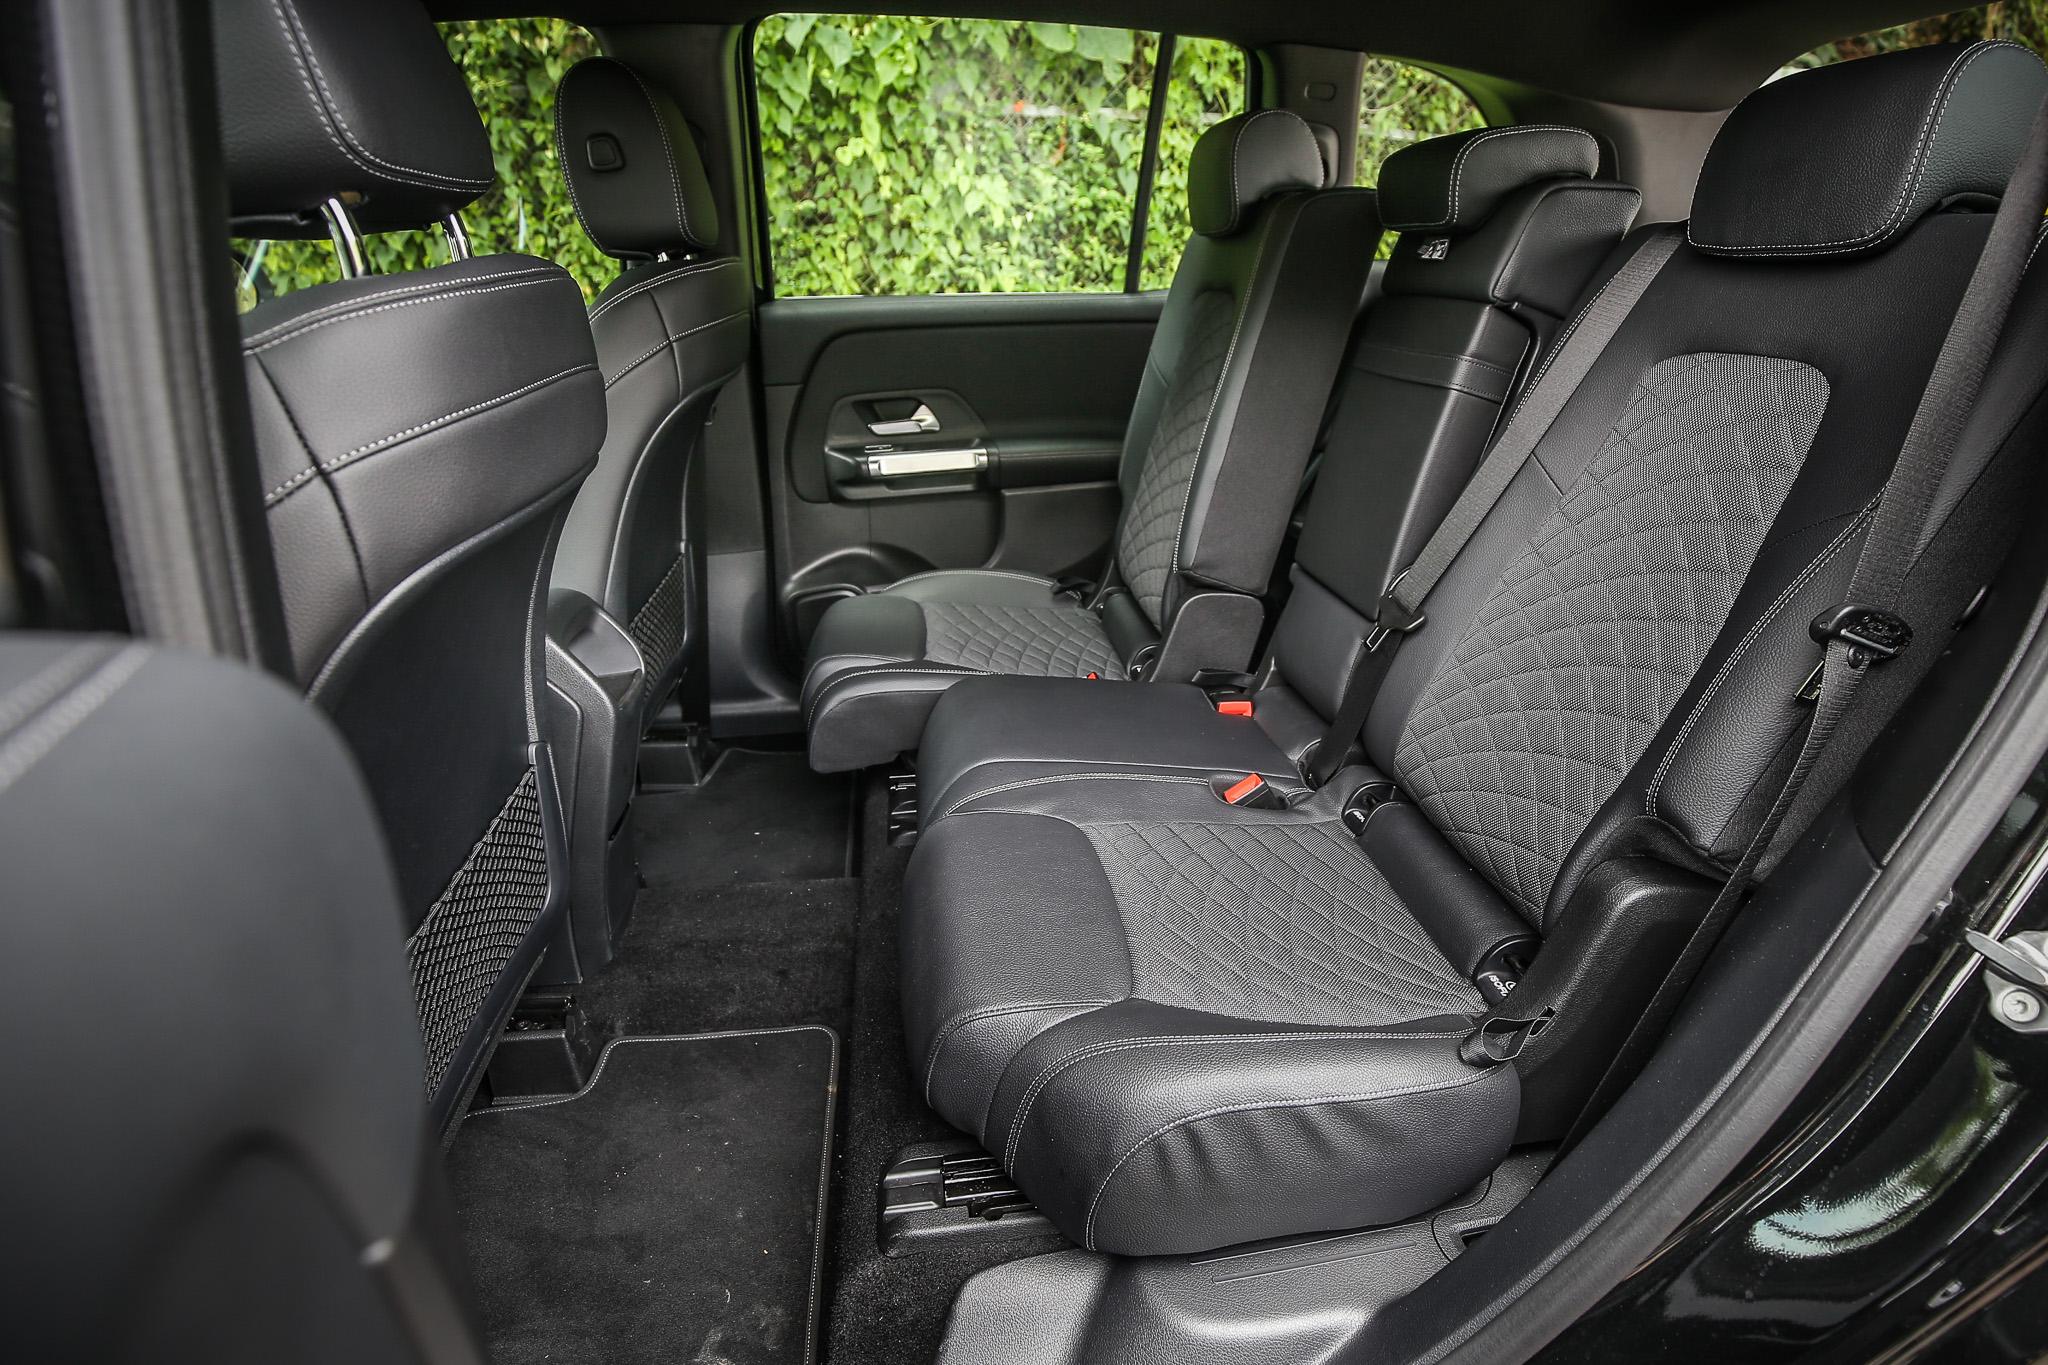 2829mm軸距長度營造相當寬敞的乘坐空間,第二排座椅並有前後調整功能(前後滑移14cm、椅背角度7段調整)。